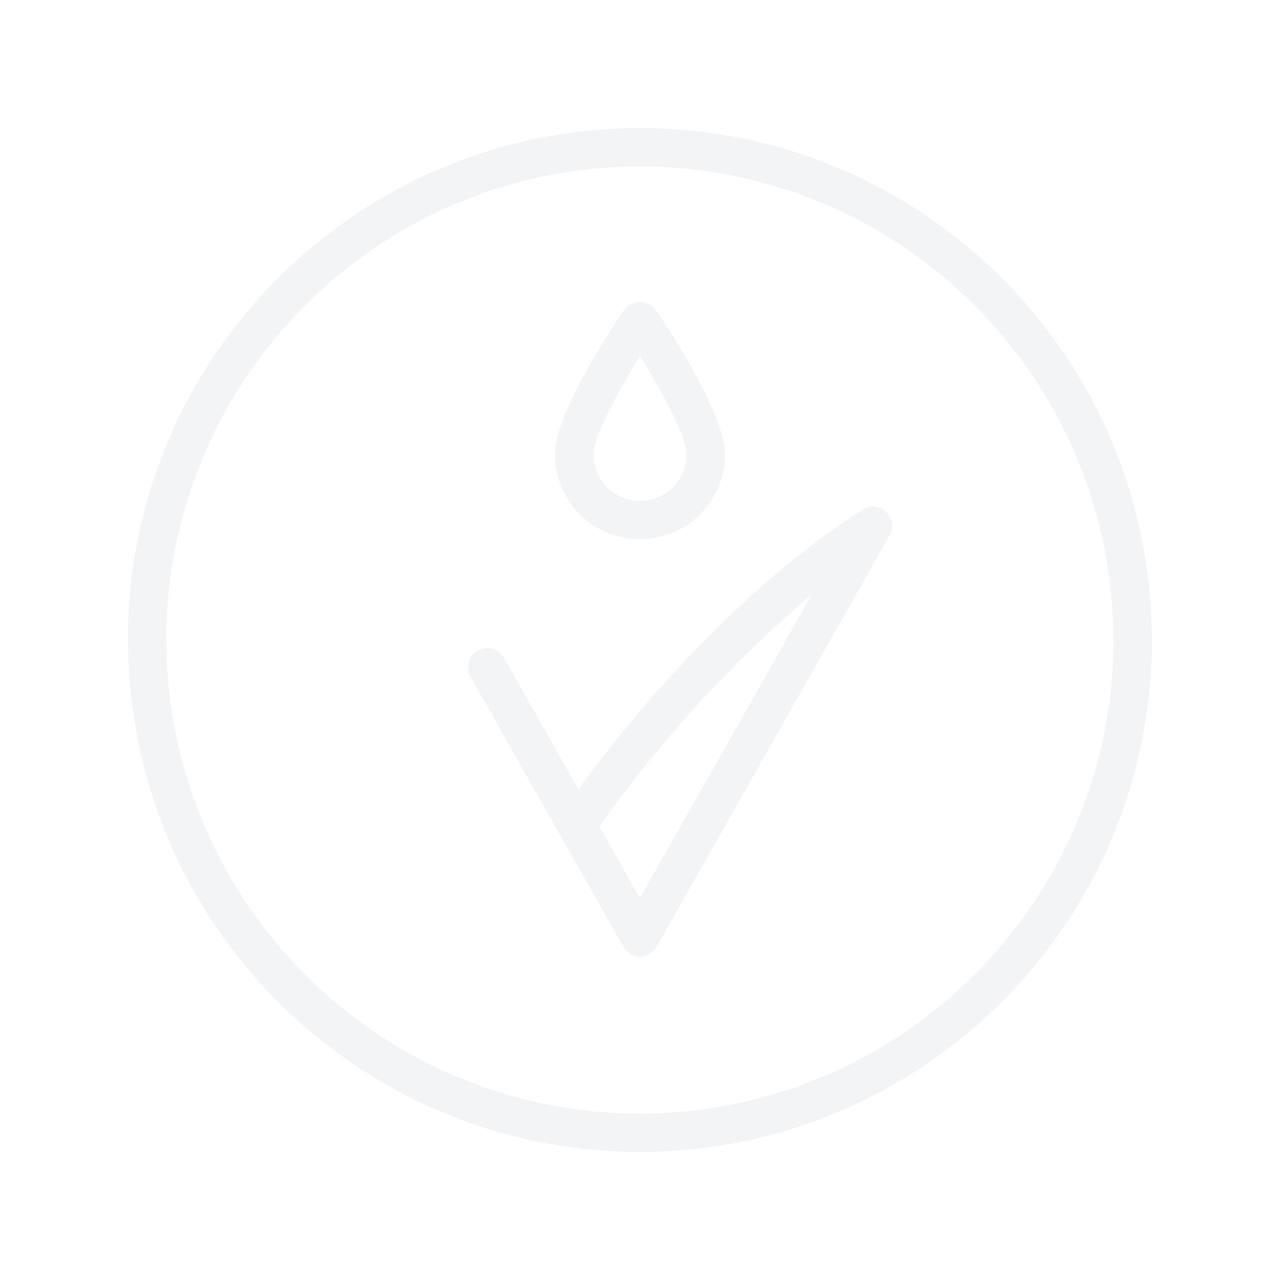 COLLISTAR Body Intensive Anti-Stretchmarks with Elastin-Plus крем против растяжек